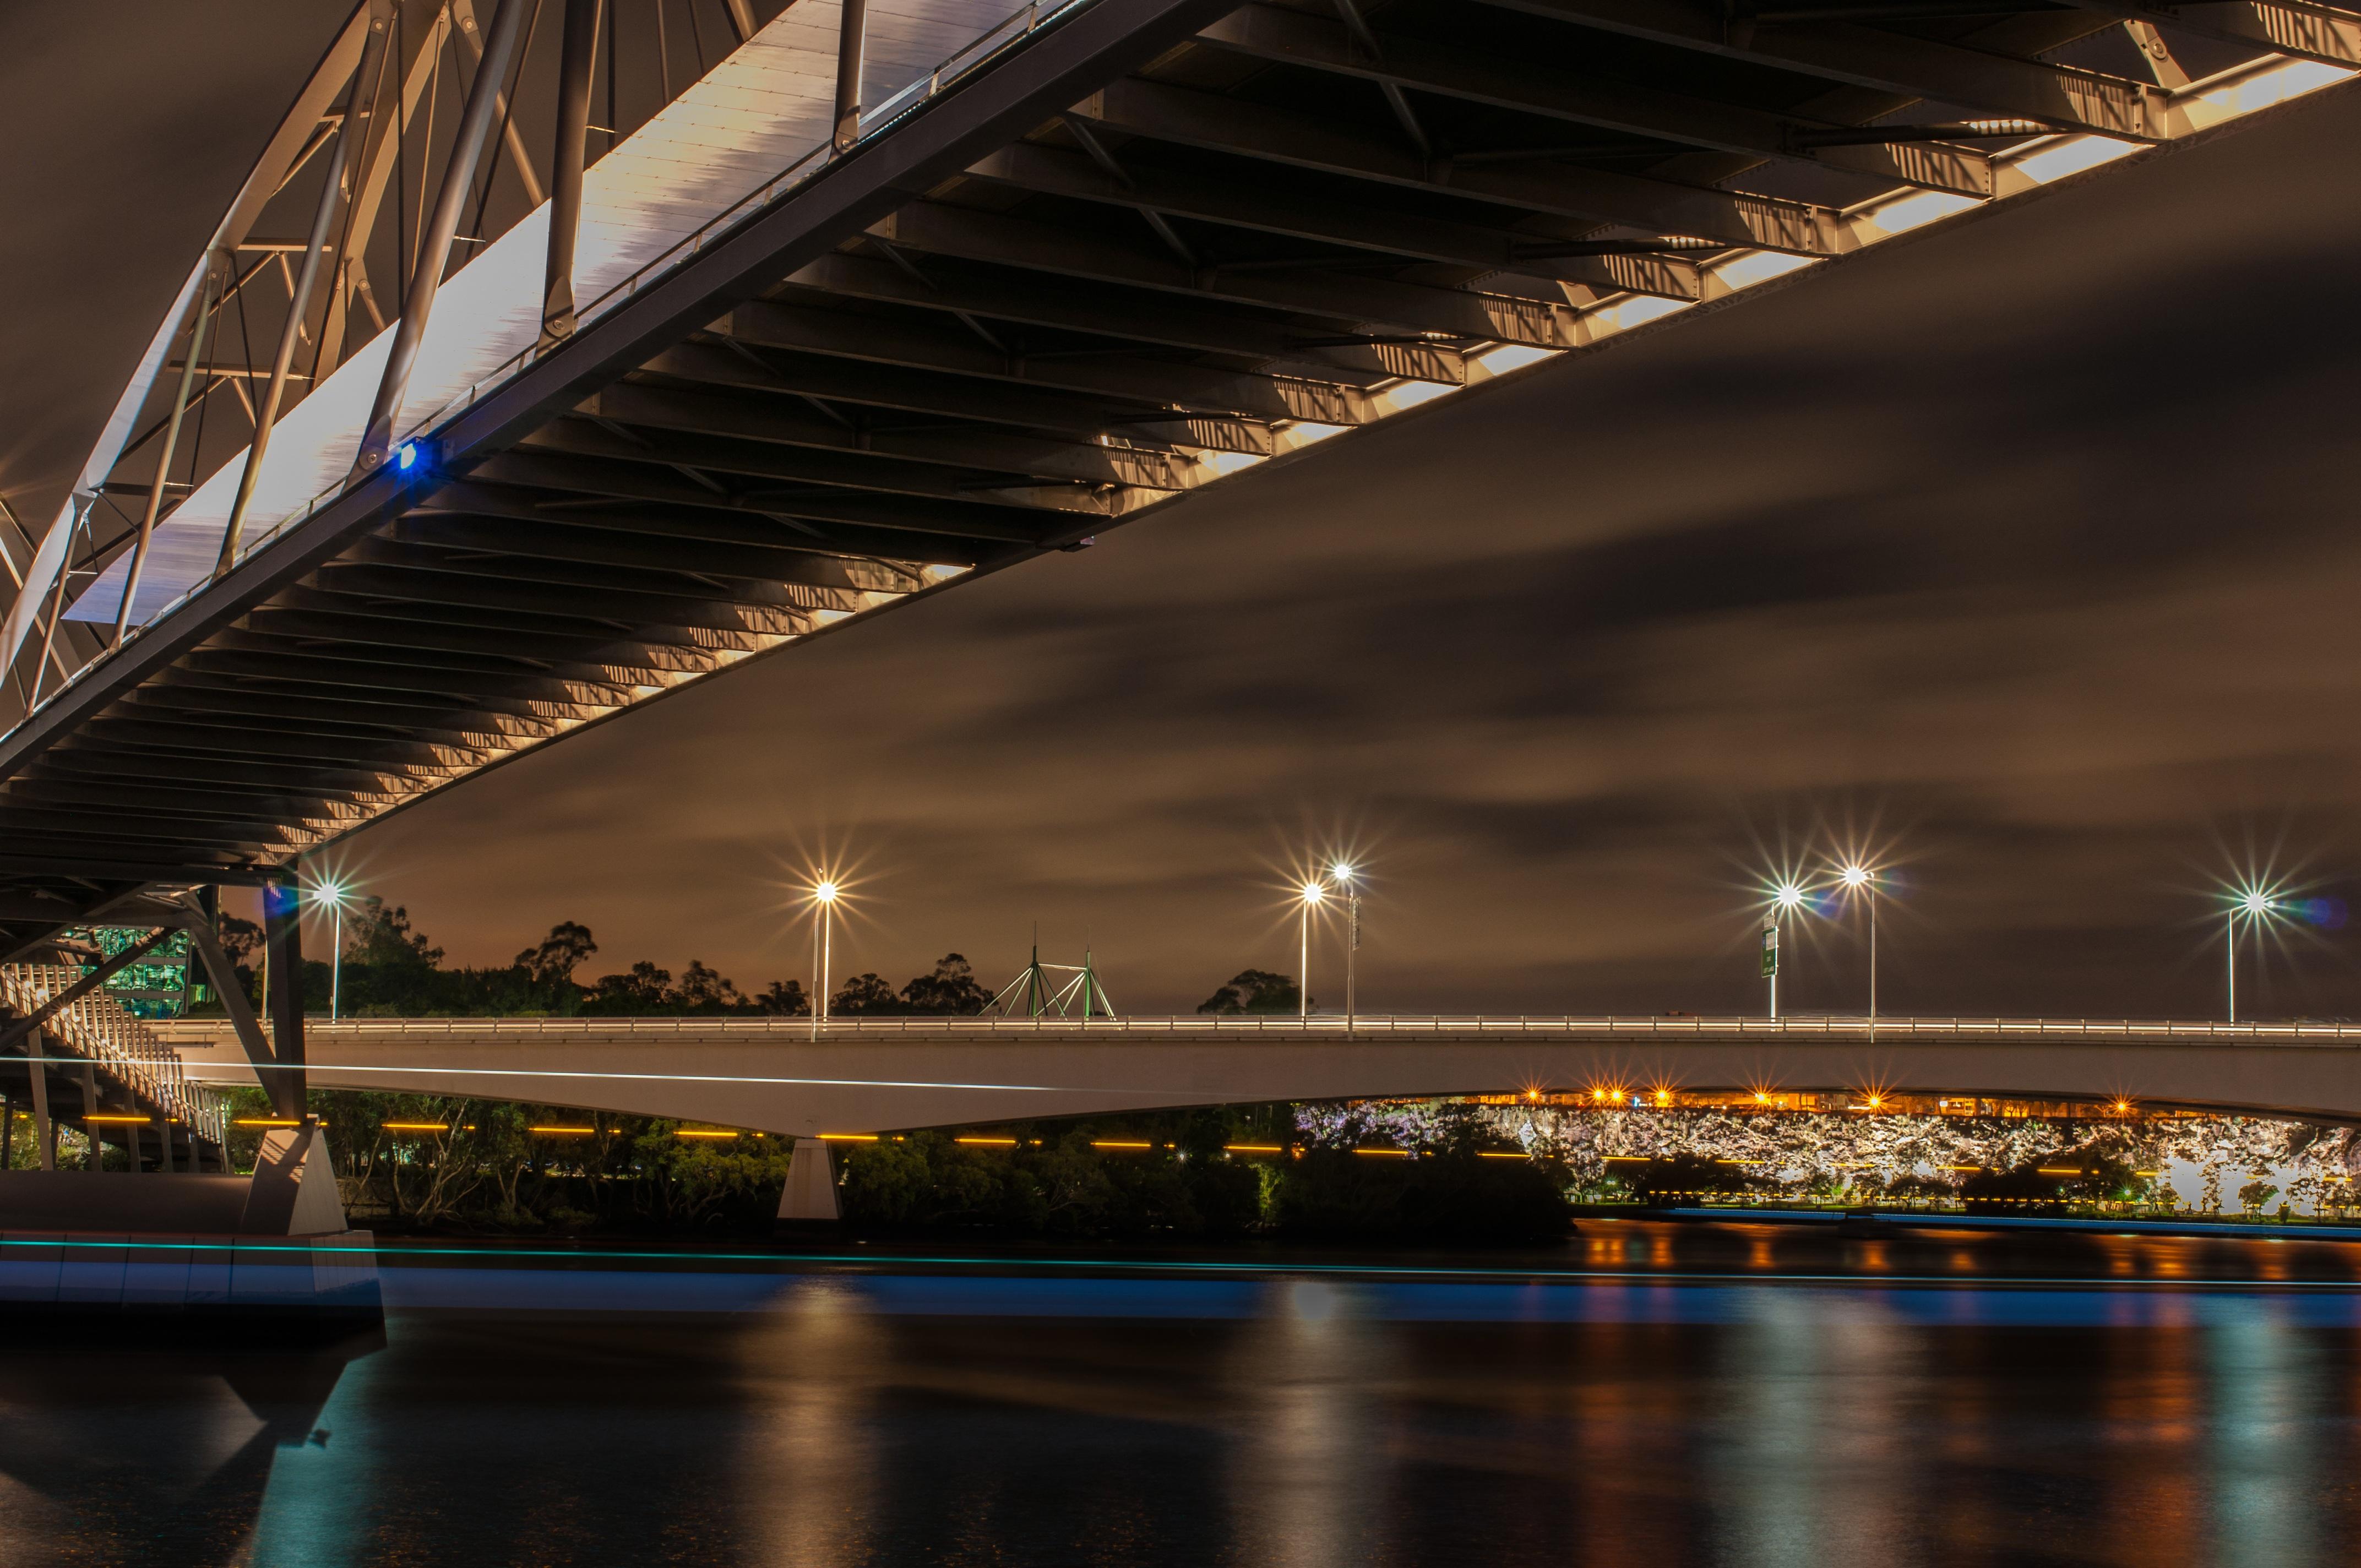 Free Images : light, skyline, night, city, river, overpass ...